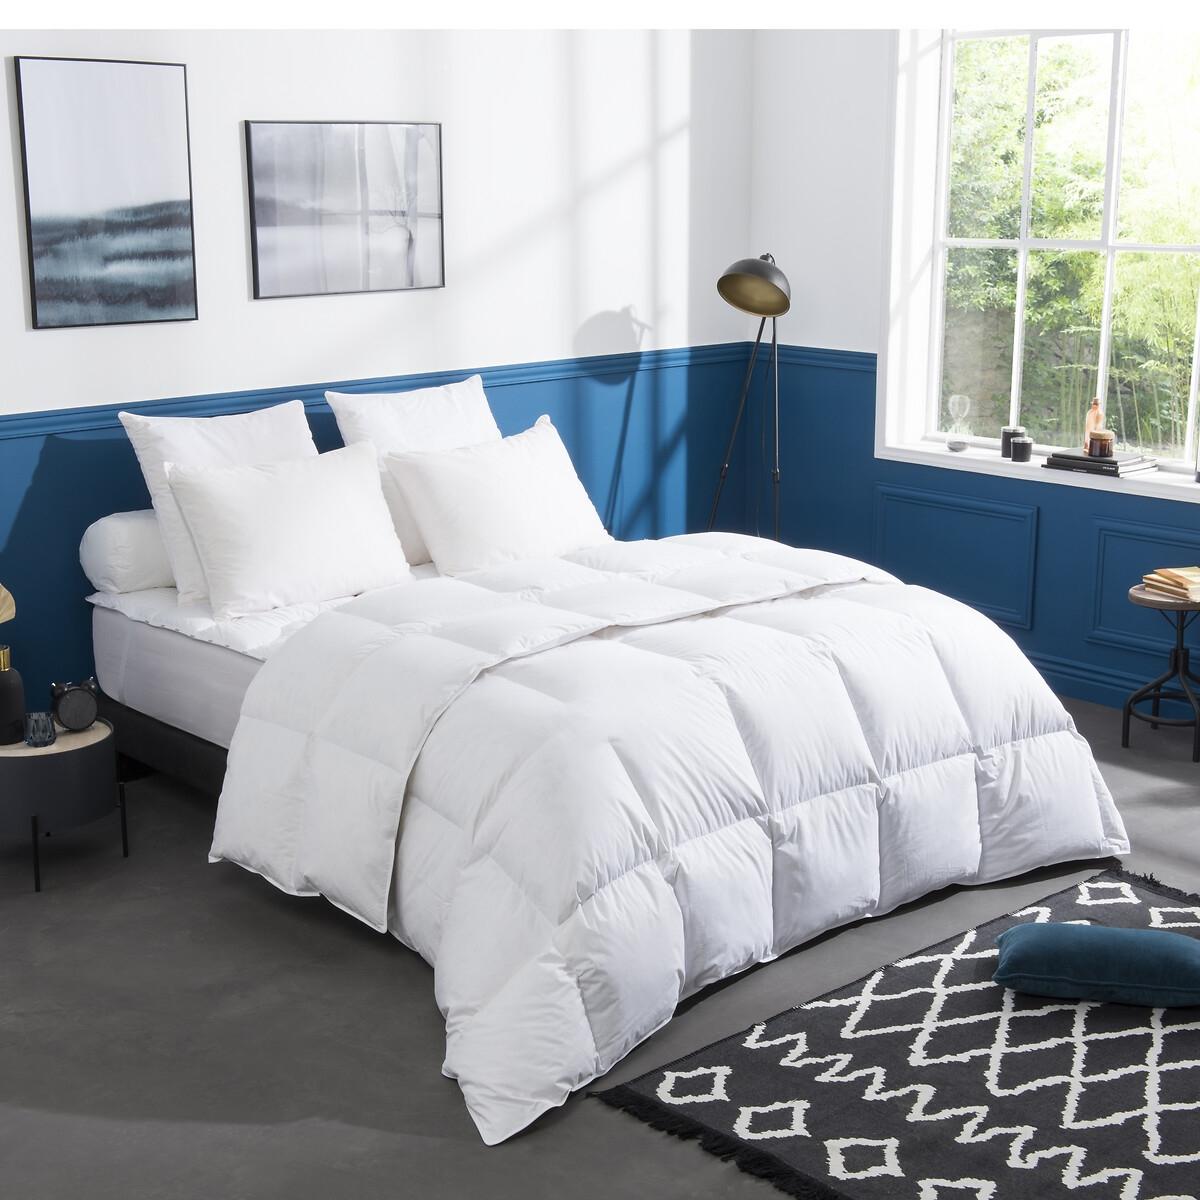 Одеяло La Redoute пуха гм с обработкой Proneem 260 x 240 см белый